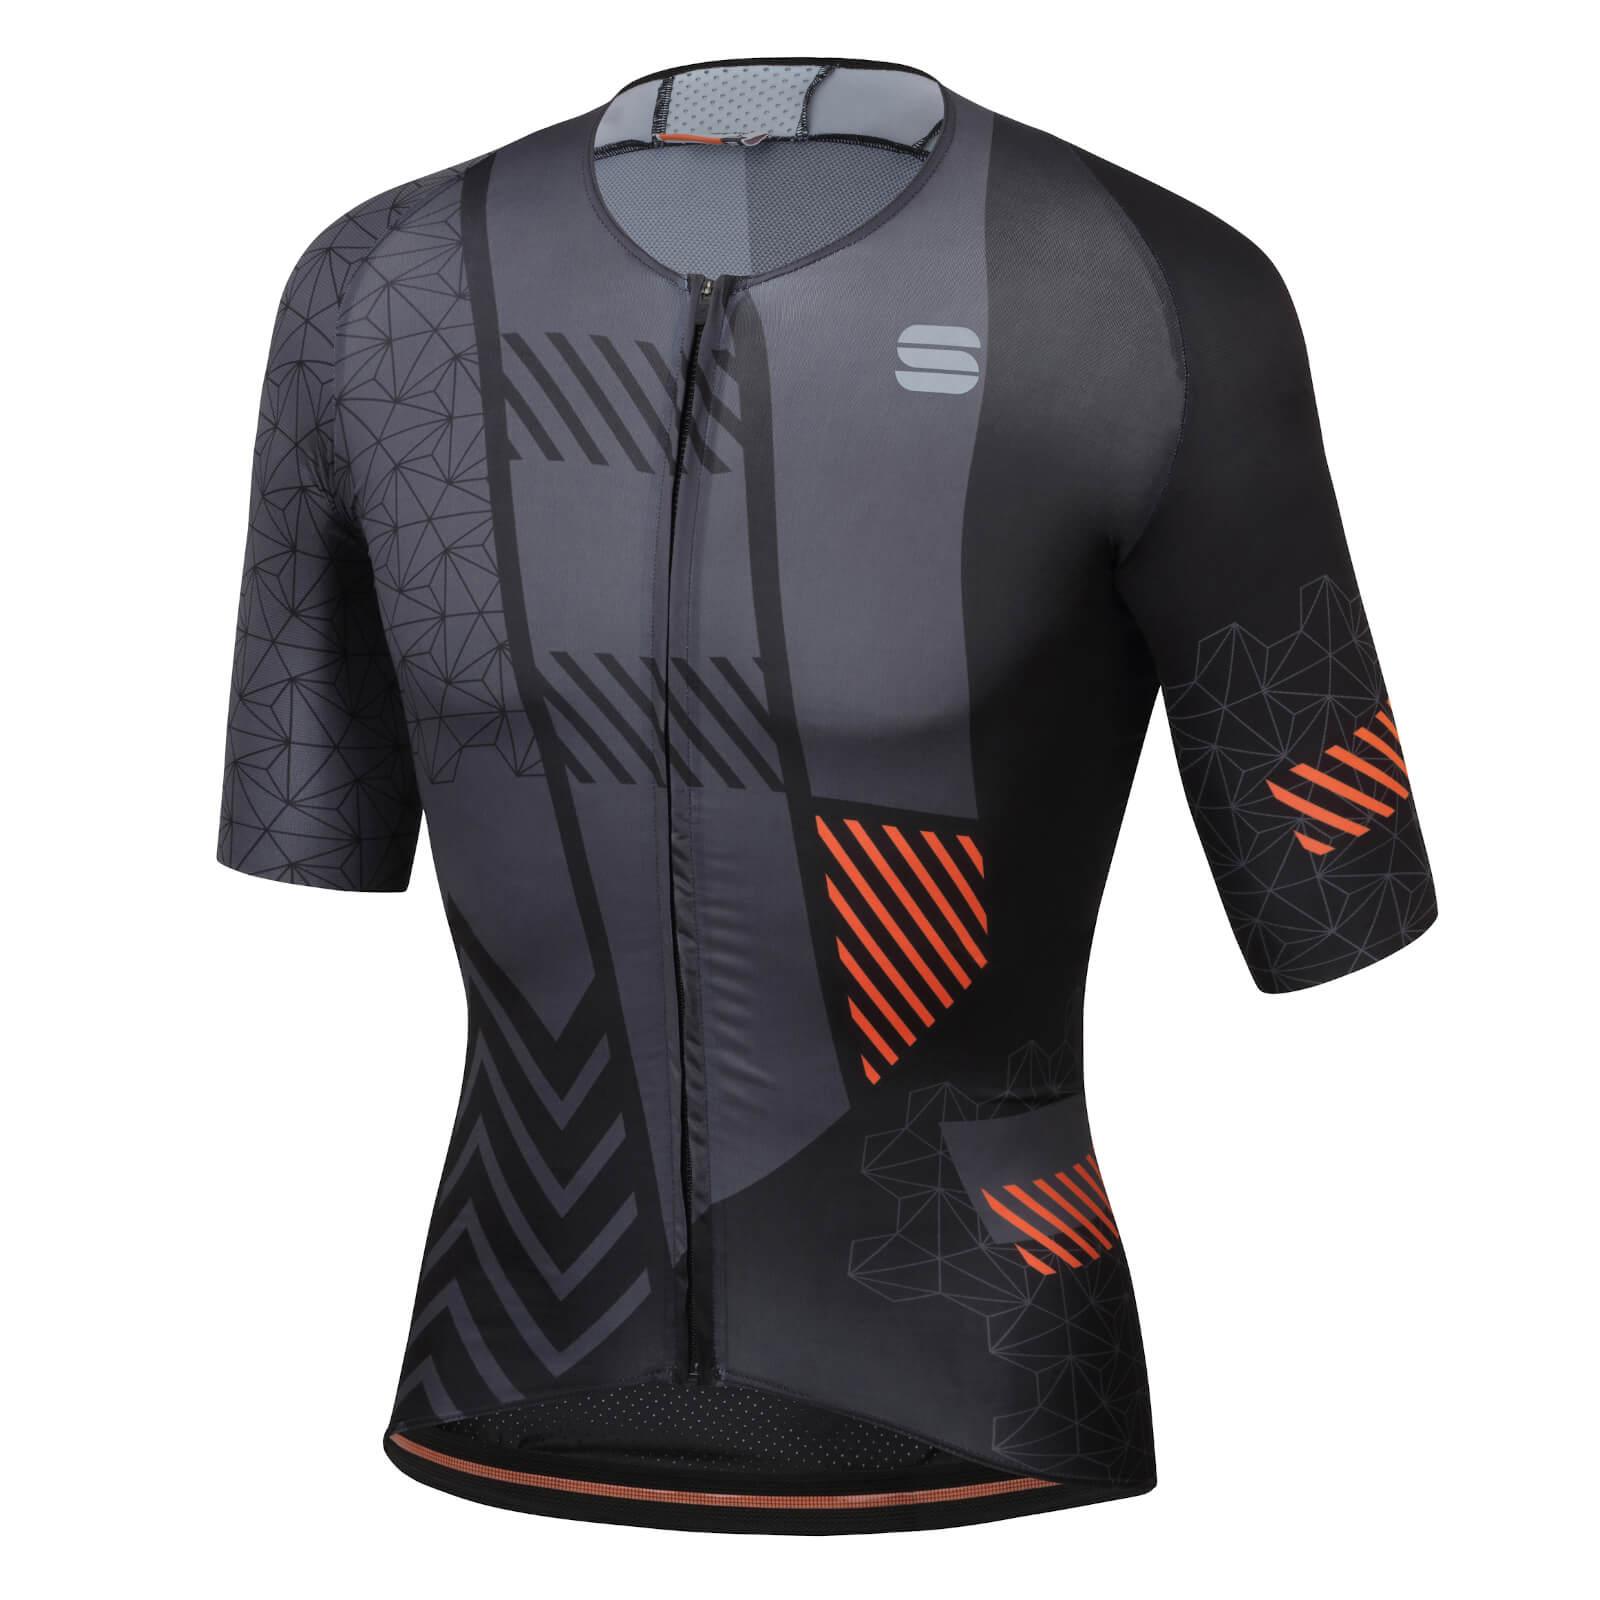 Sportful BodyFit Pro Bomber Jersey - XXL - Black/Anthracite